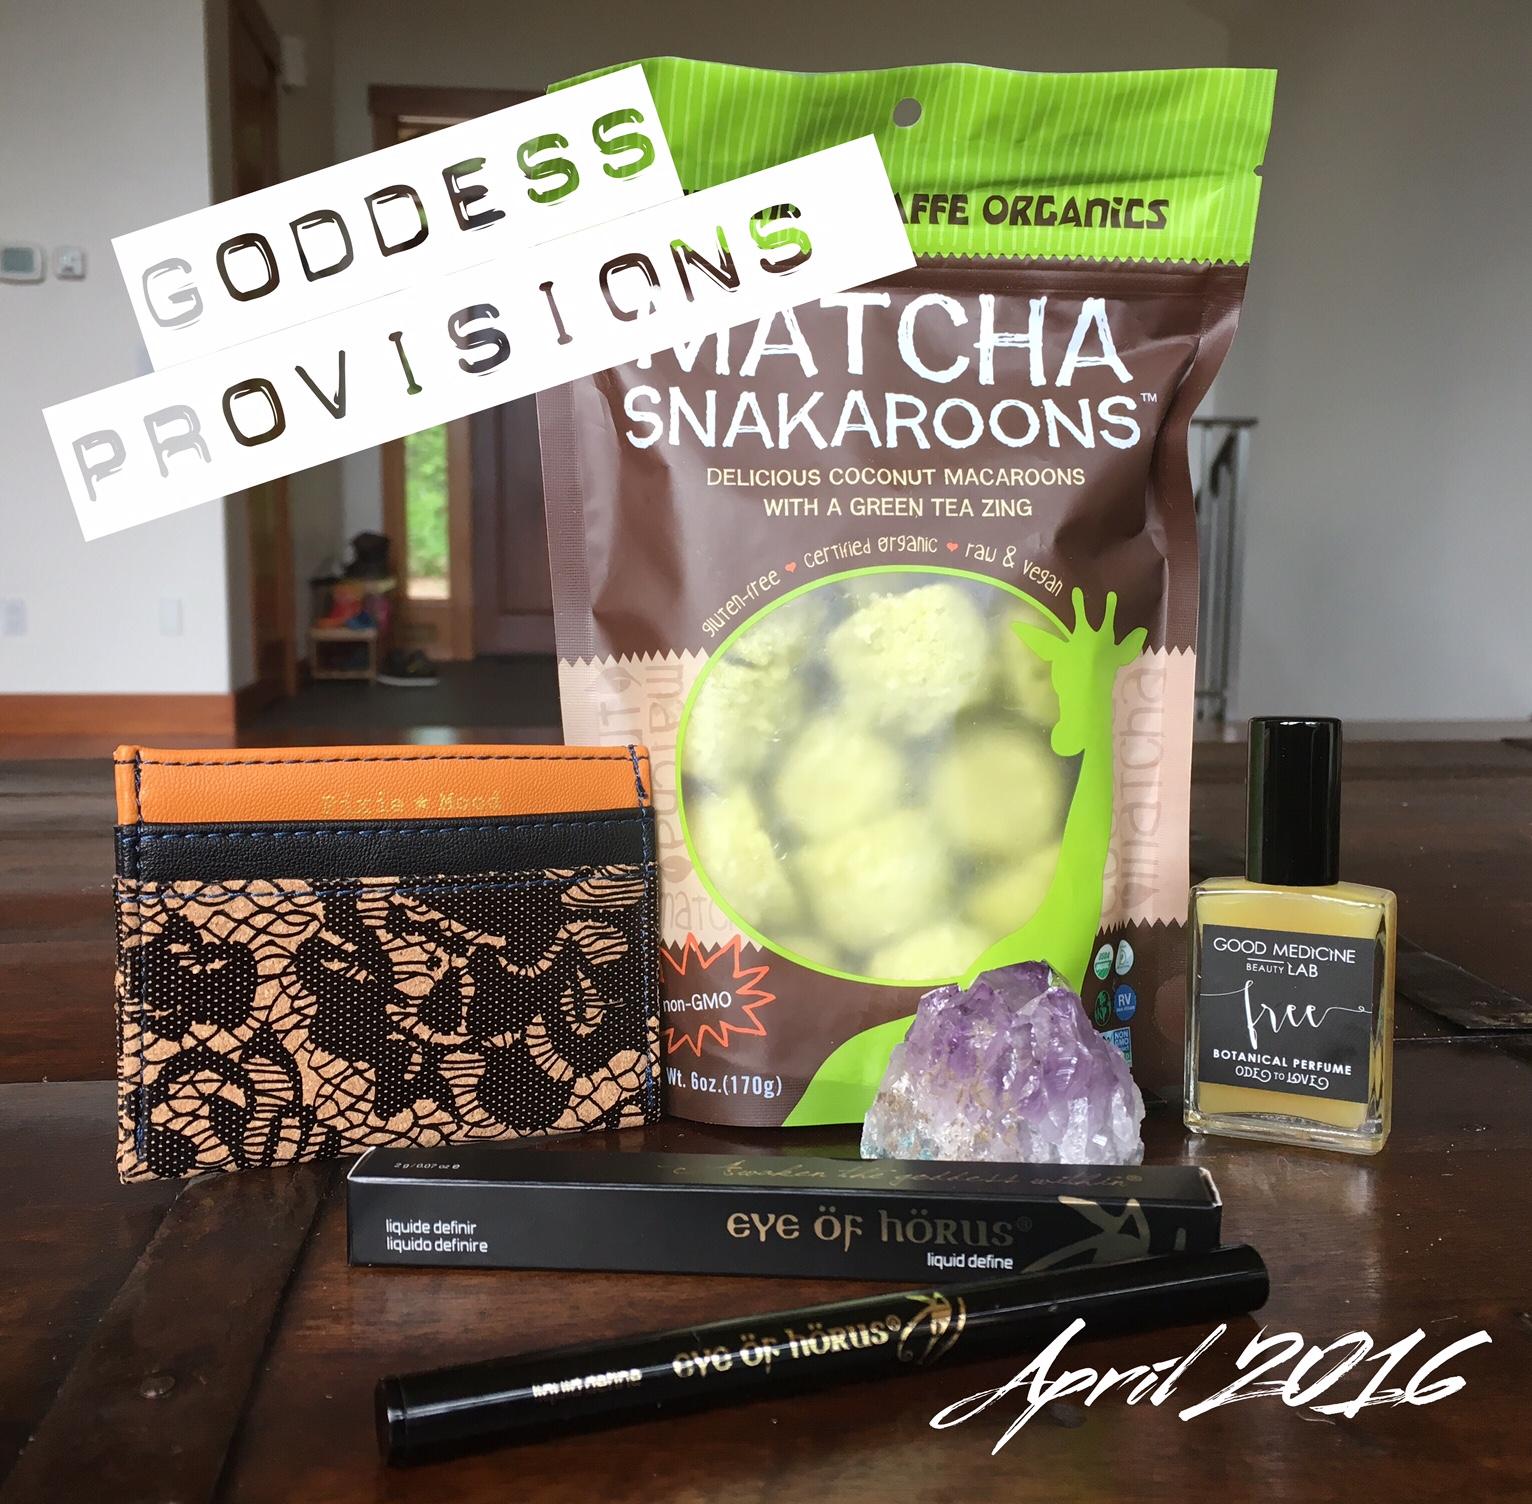 Goddess Provisions April 2016